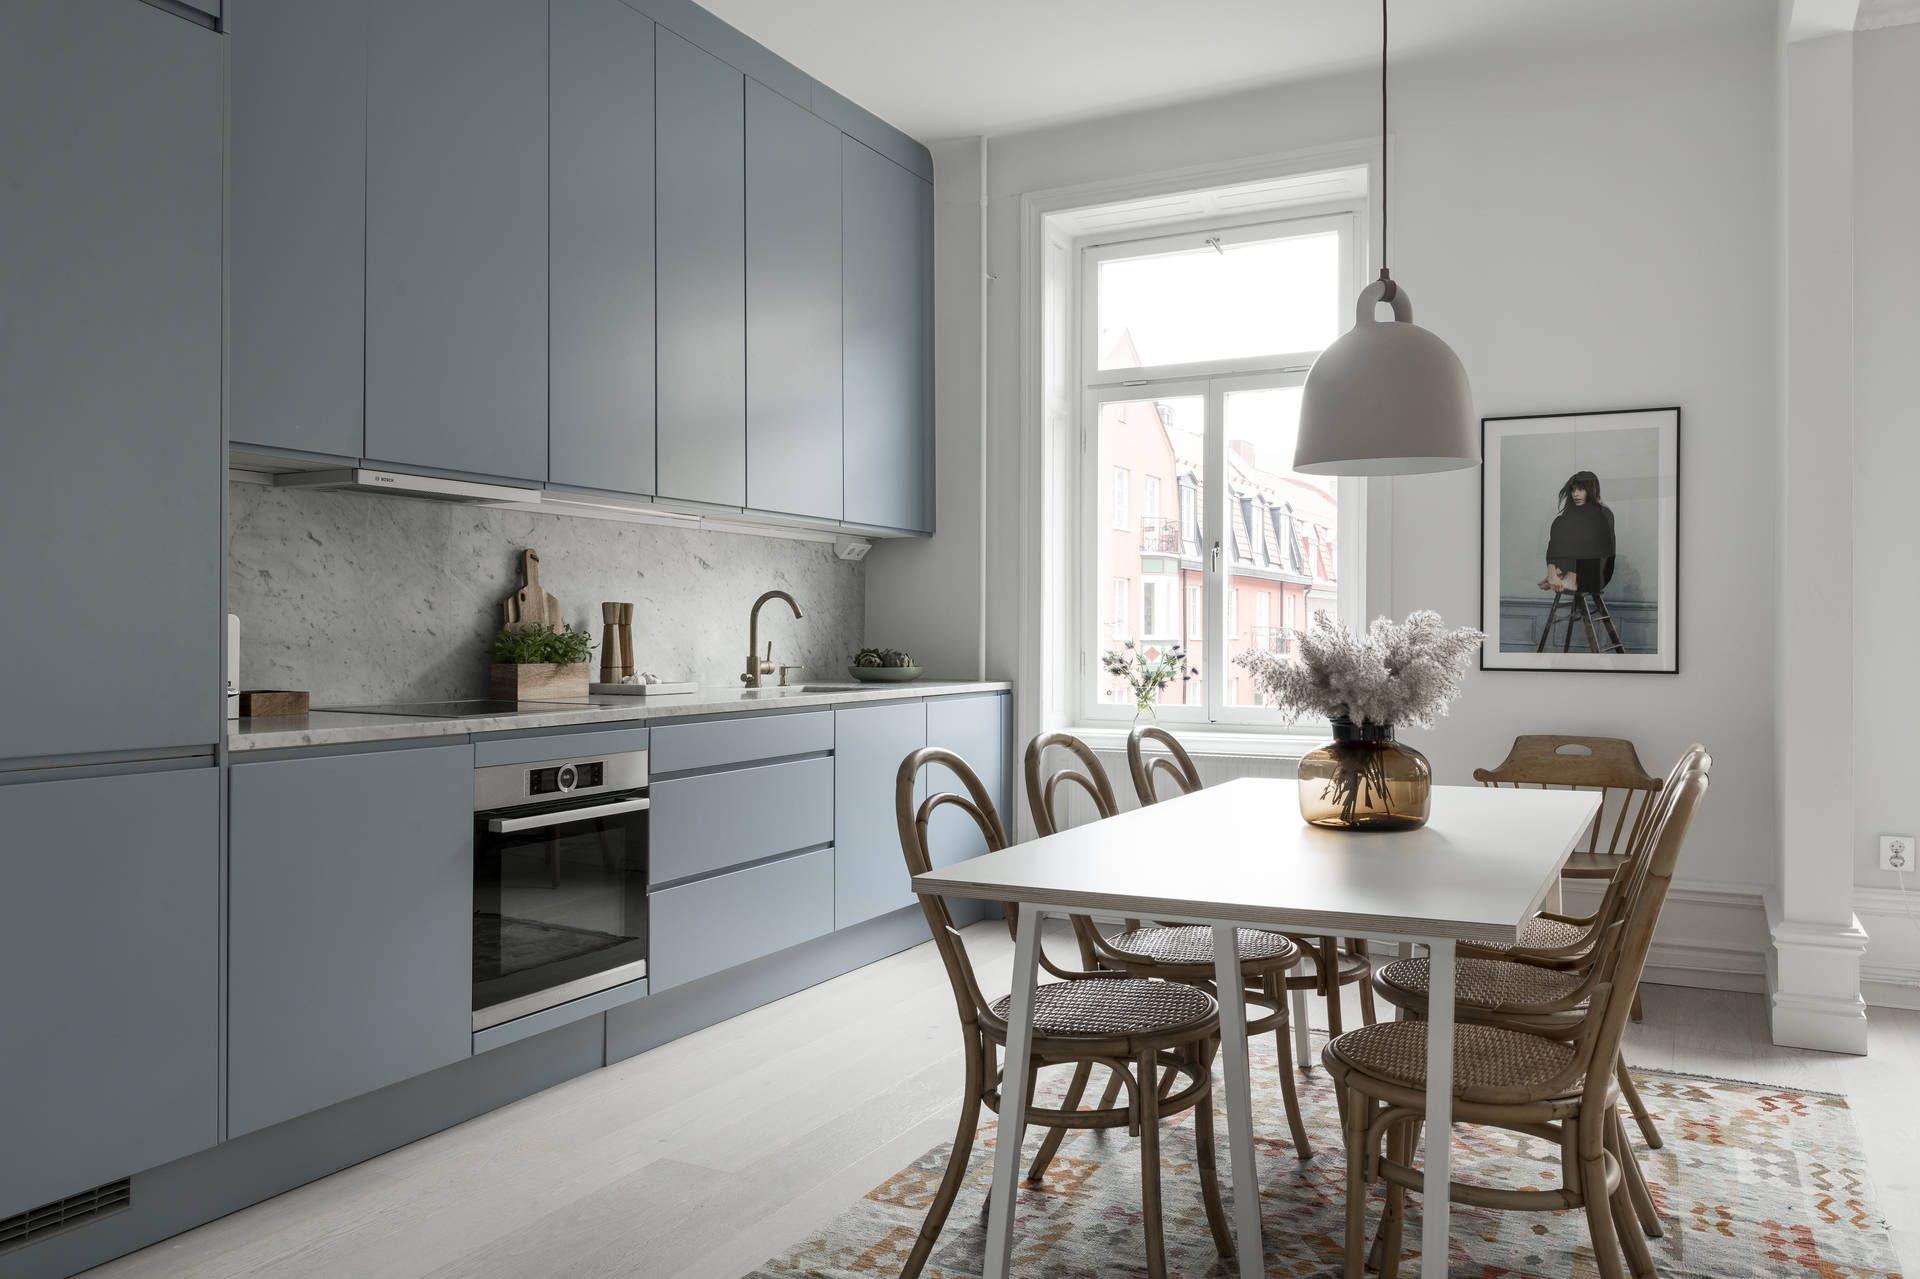 spacious light blue kitchen kitchen design tips light blue kitchens pastel interior on kitchen decor blue id=22145